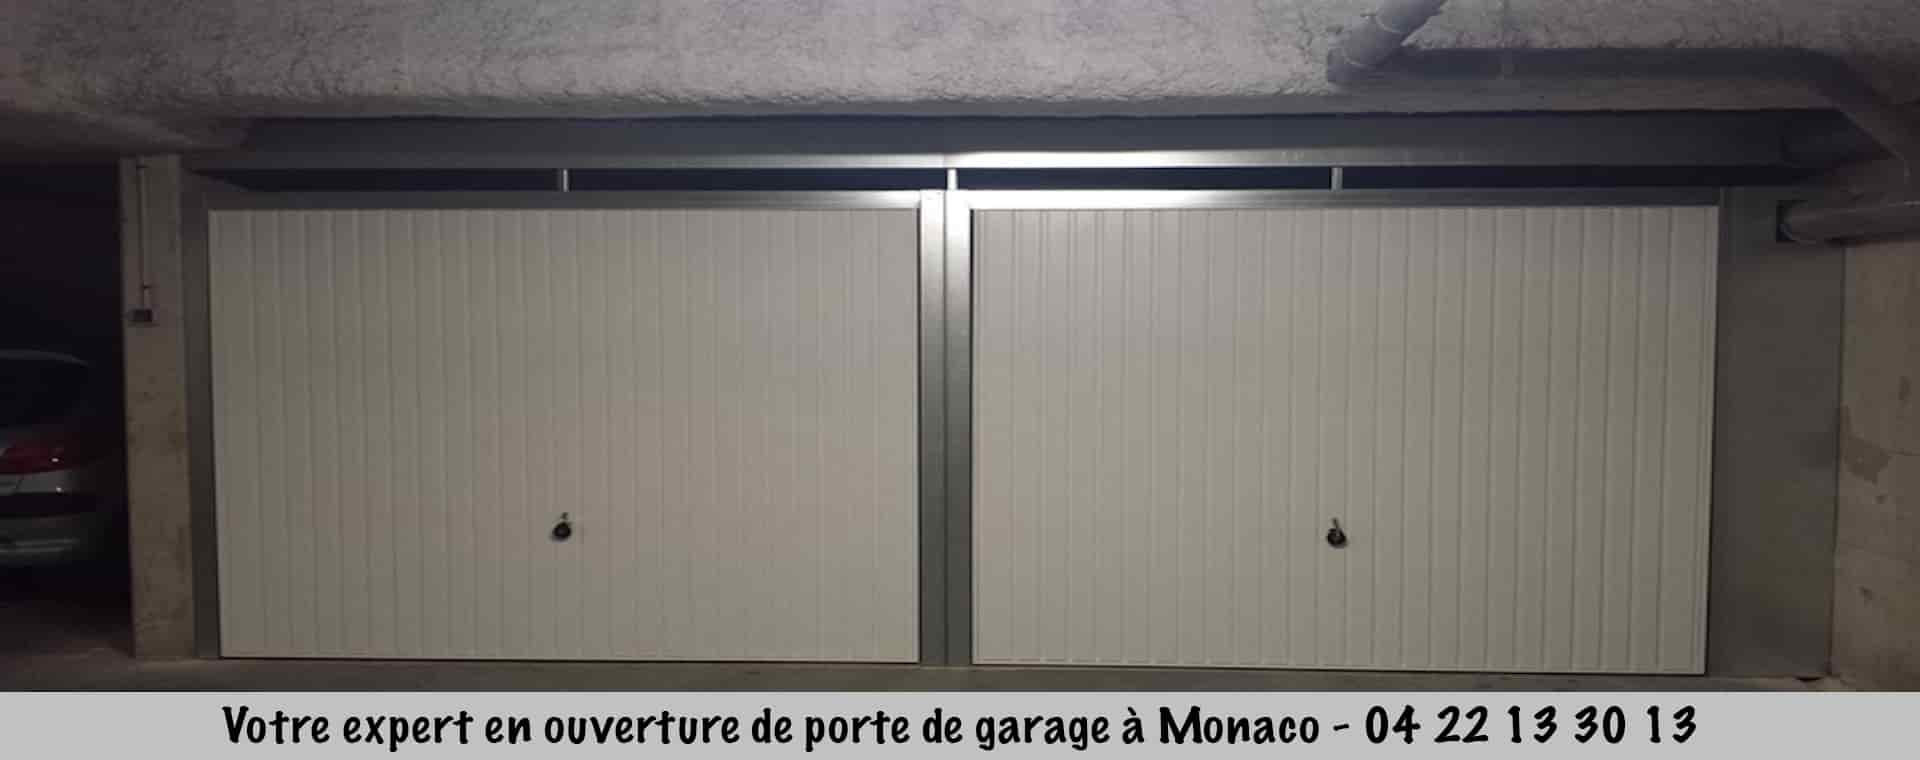 ouverture porte de garage a monaco, porte de garage a monaco, porte d egarage hormann a monaco, serrurier porte de garage a monaco fontvieille 98000, ouverture porte de garage novoferm a monaco, ouverture porte de garage a monaco monte carlo